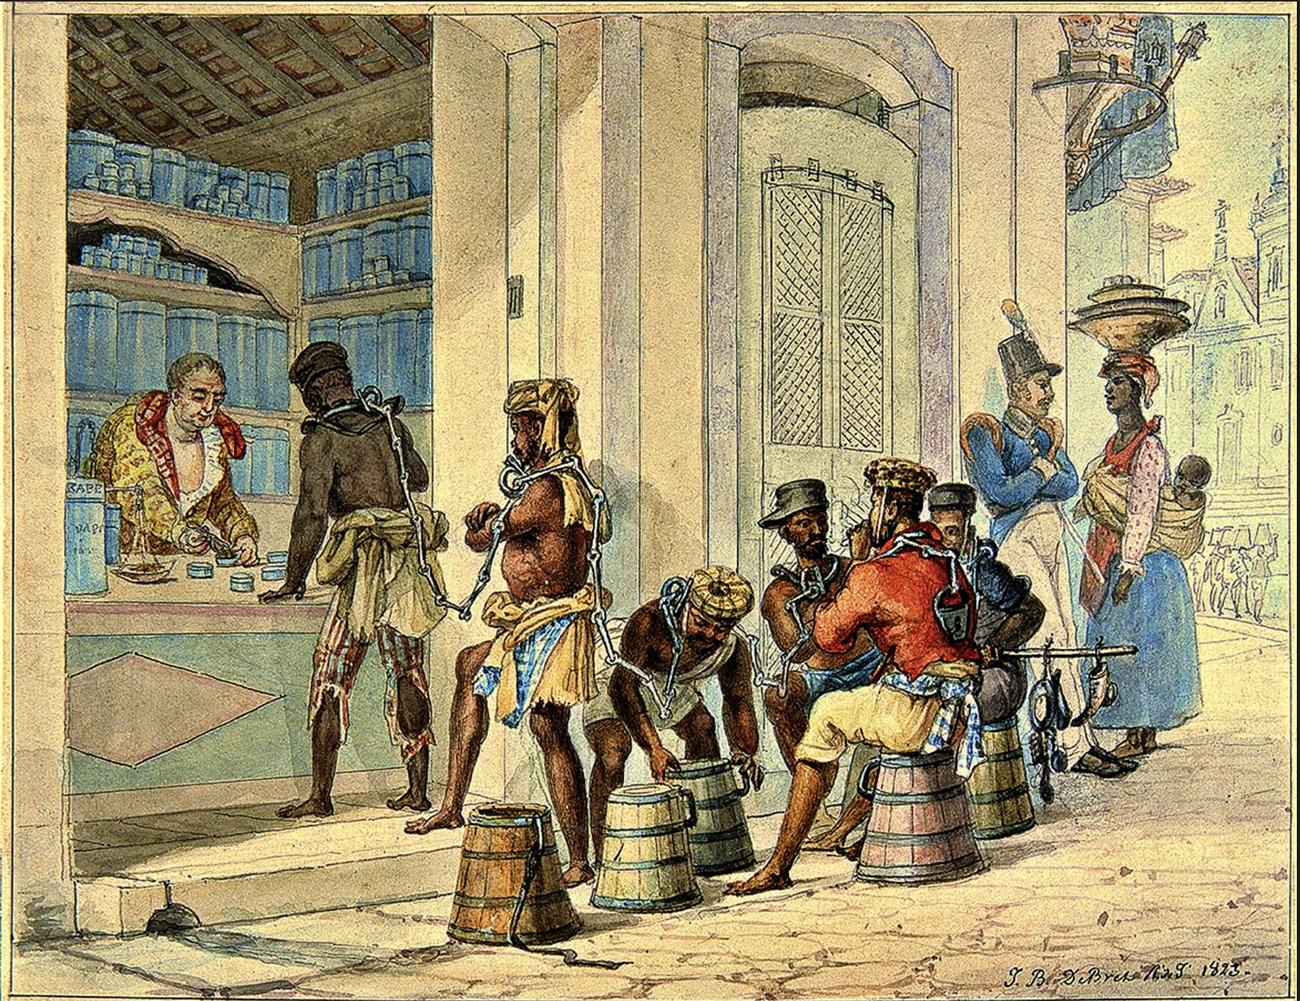 negros em venda, gravura de Debret